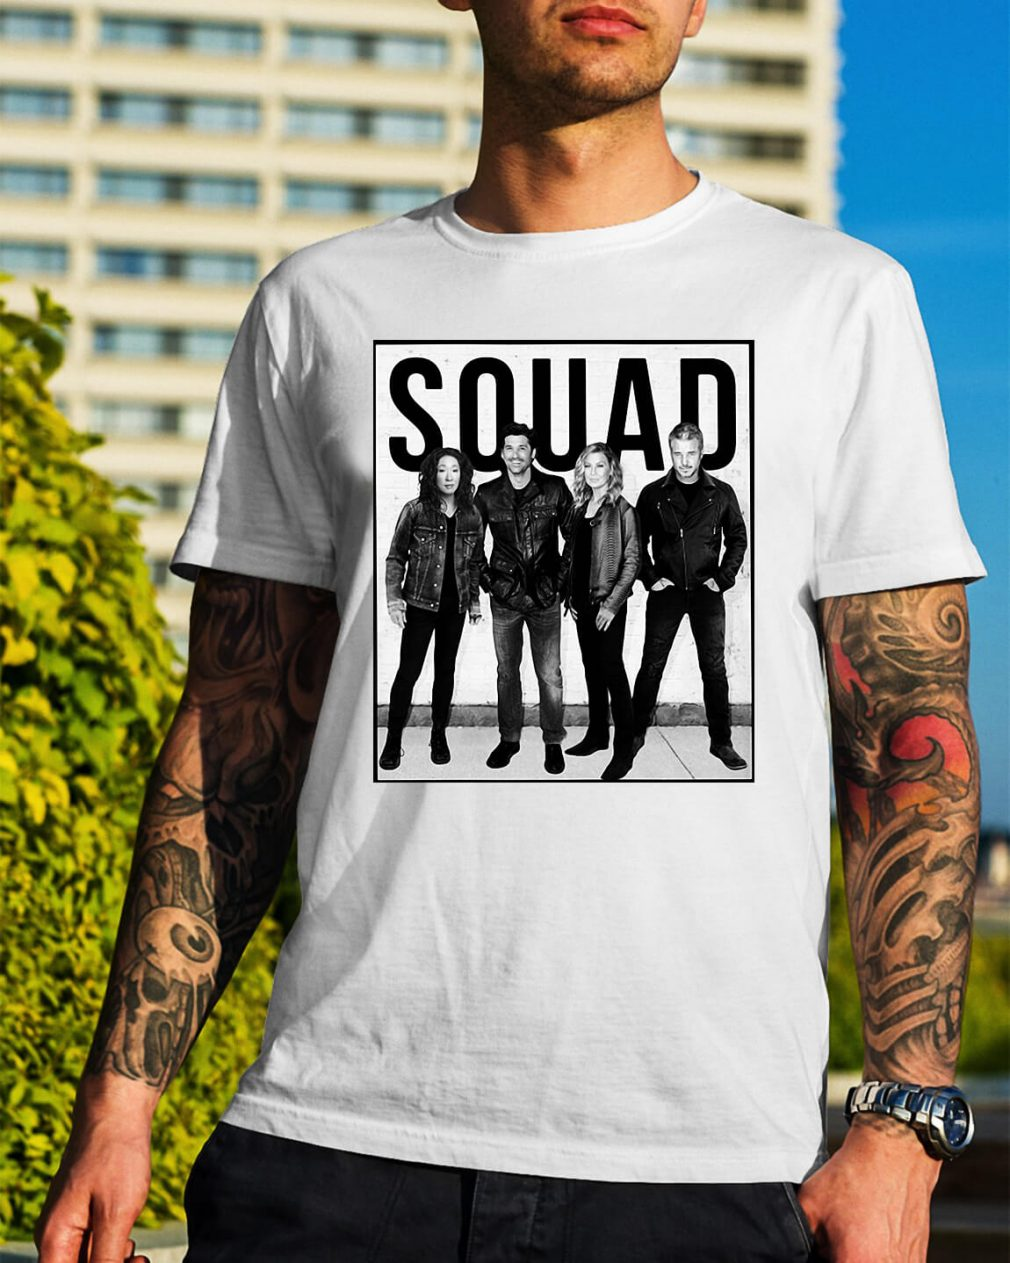 The Grey's Anatomy squad shirt